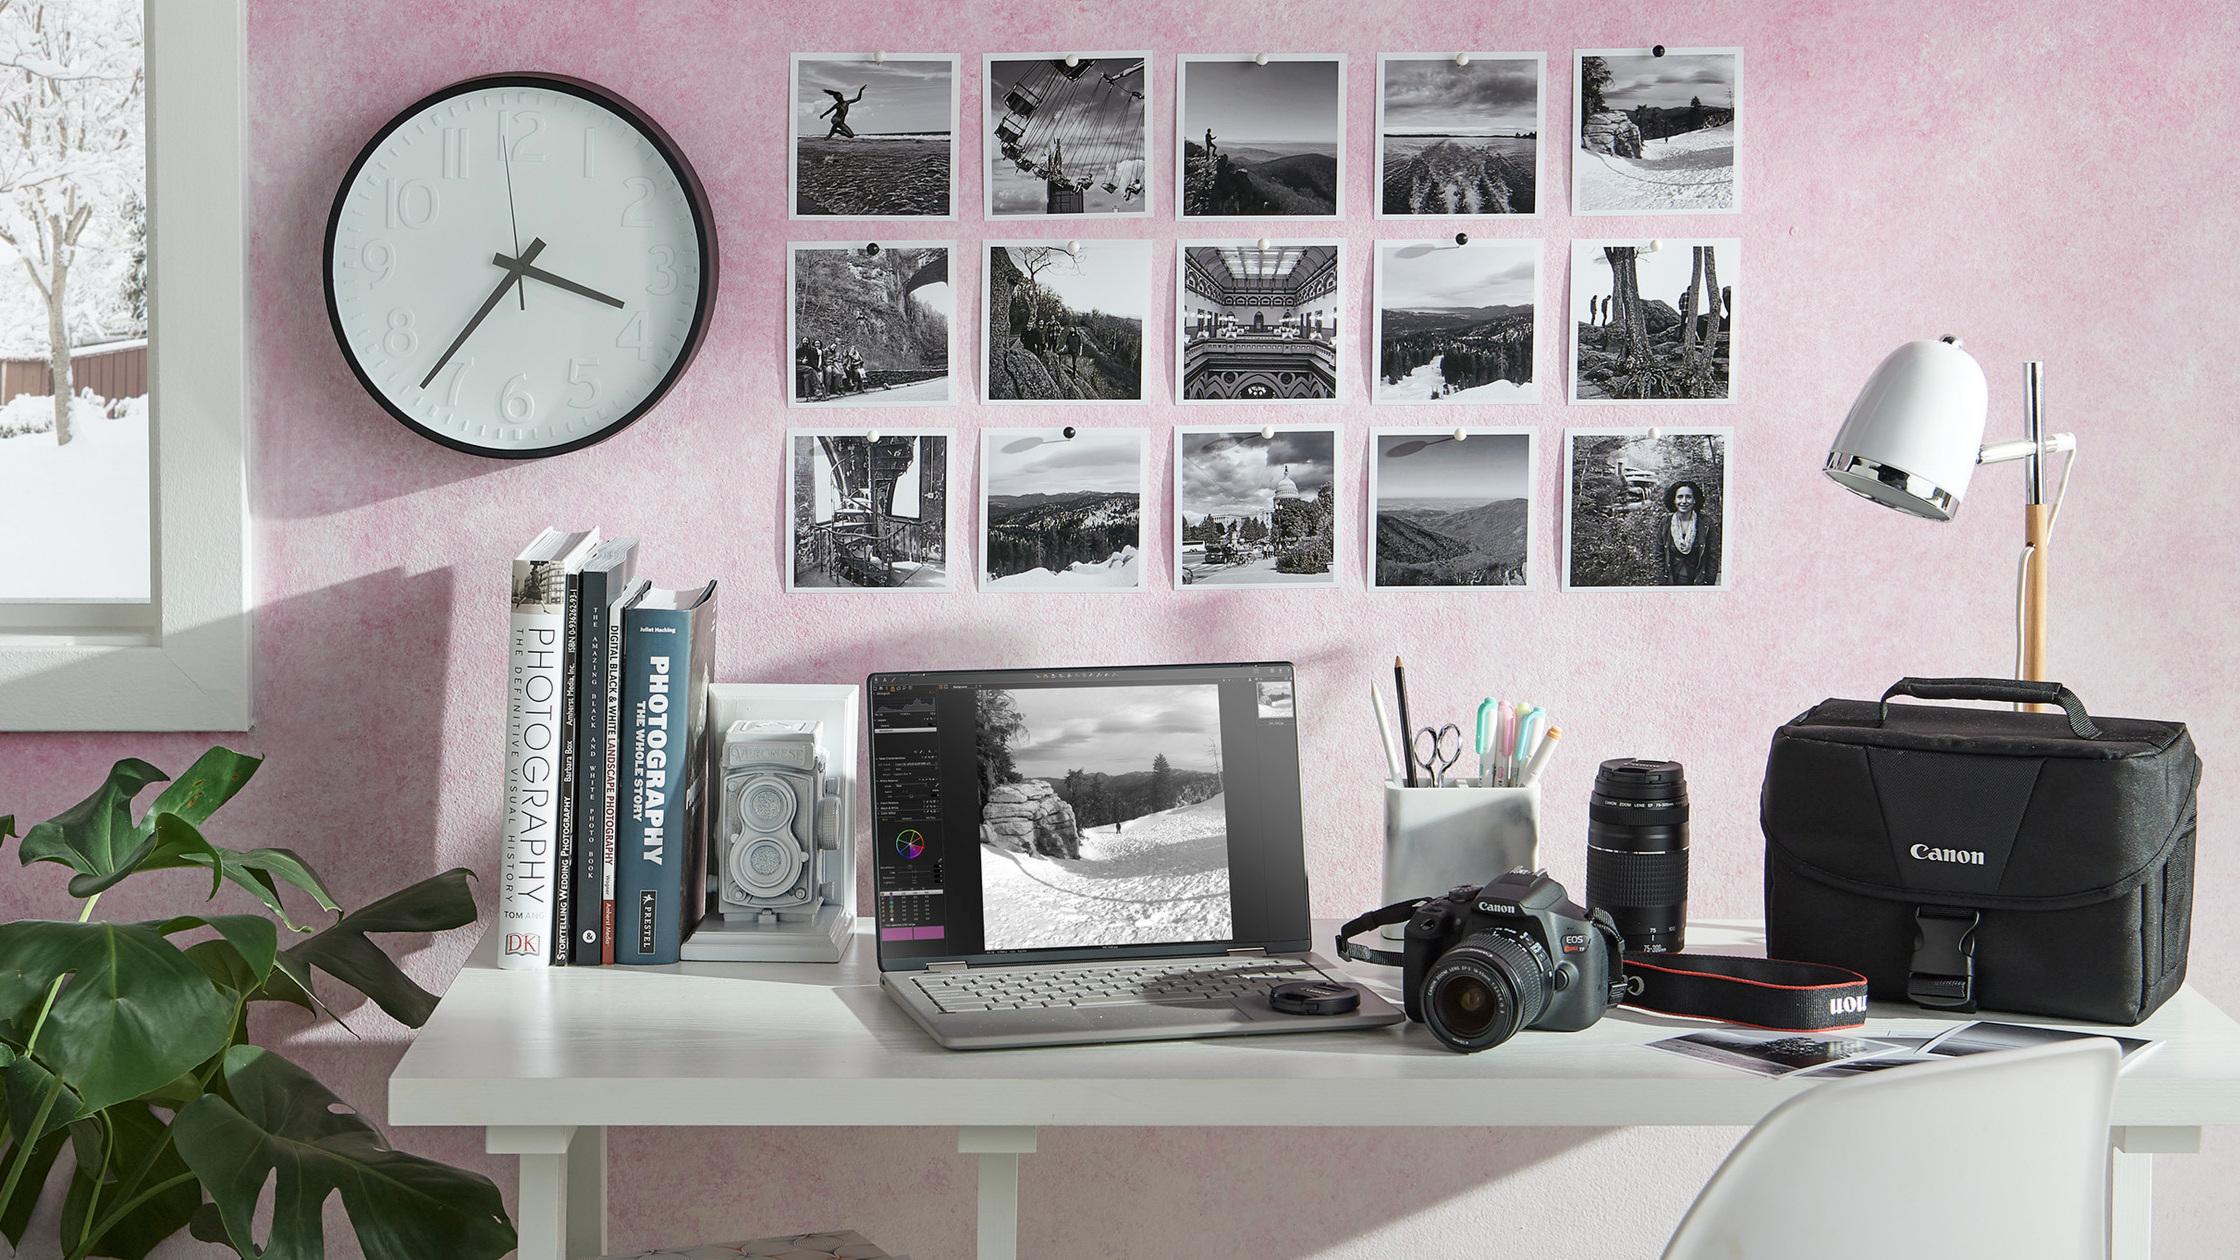 46004_Photographerstudio_ENT_Electronics_Canon_Camera22220_Horz.jpg